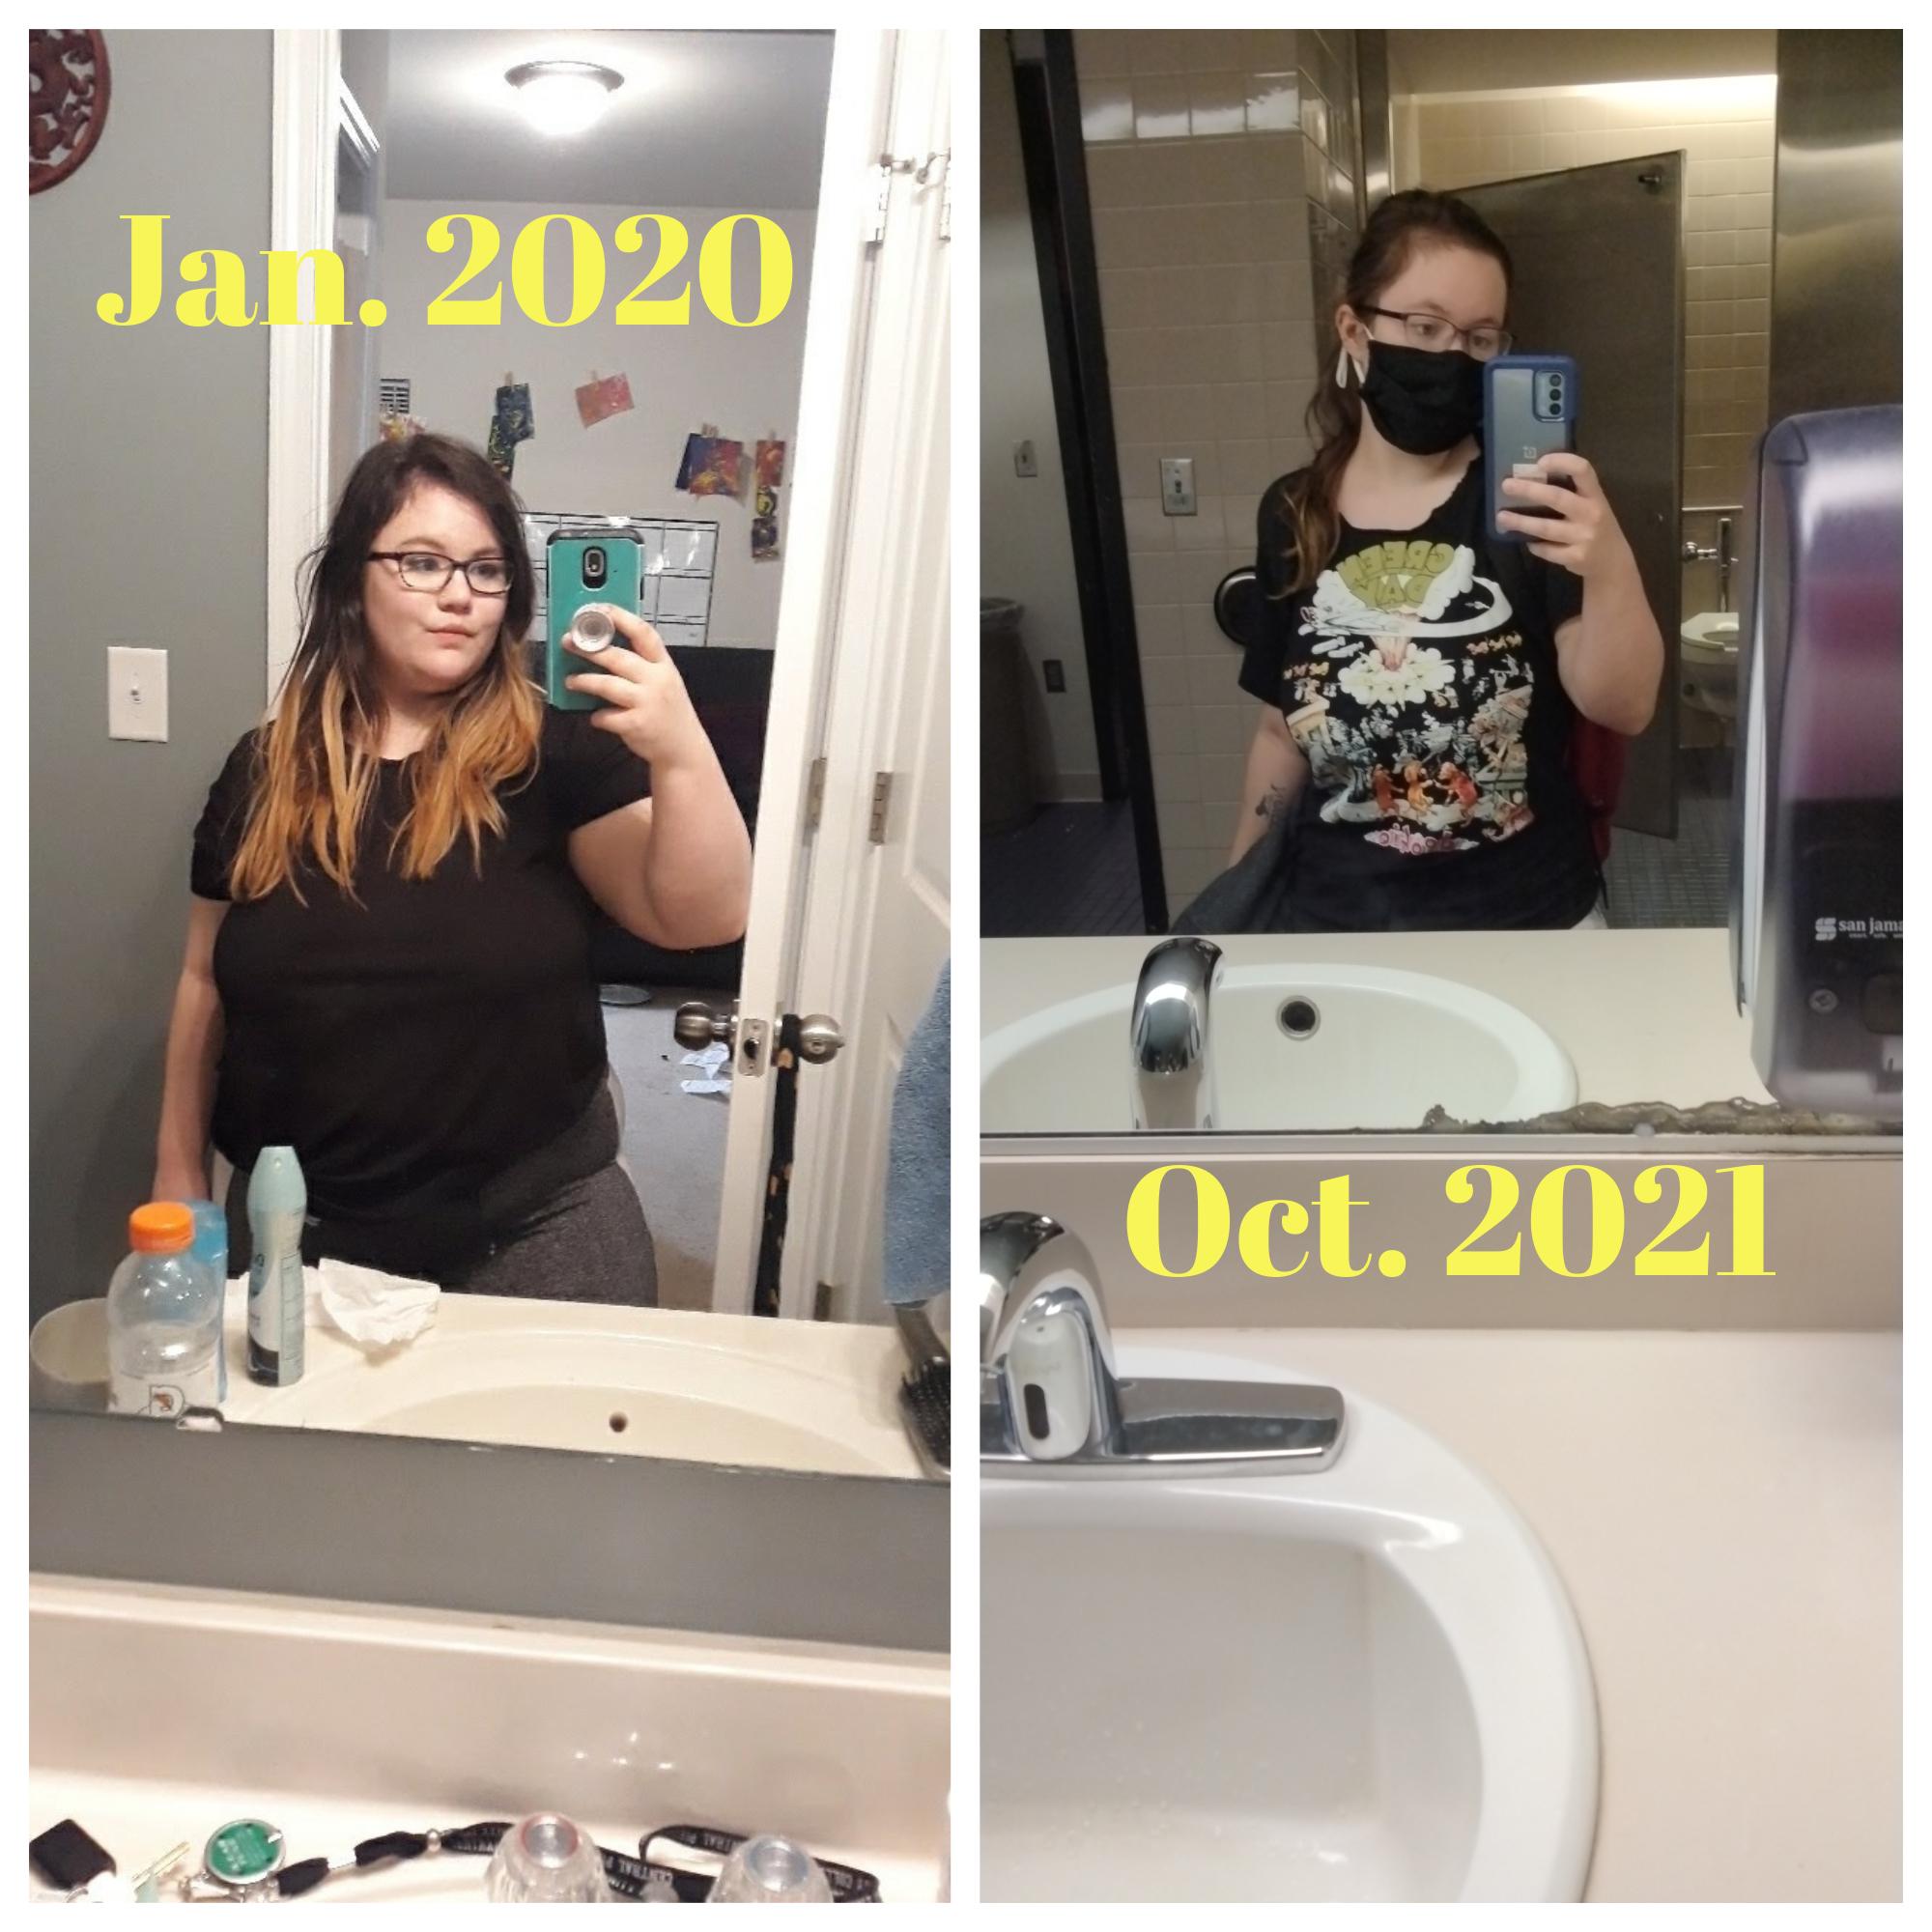 80 lbs Weight Loss 4'11 Female 220 lbs to 140 lbs